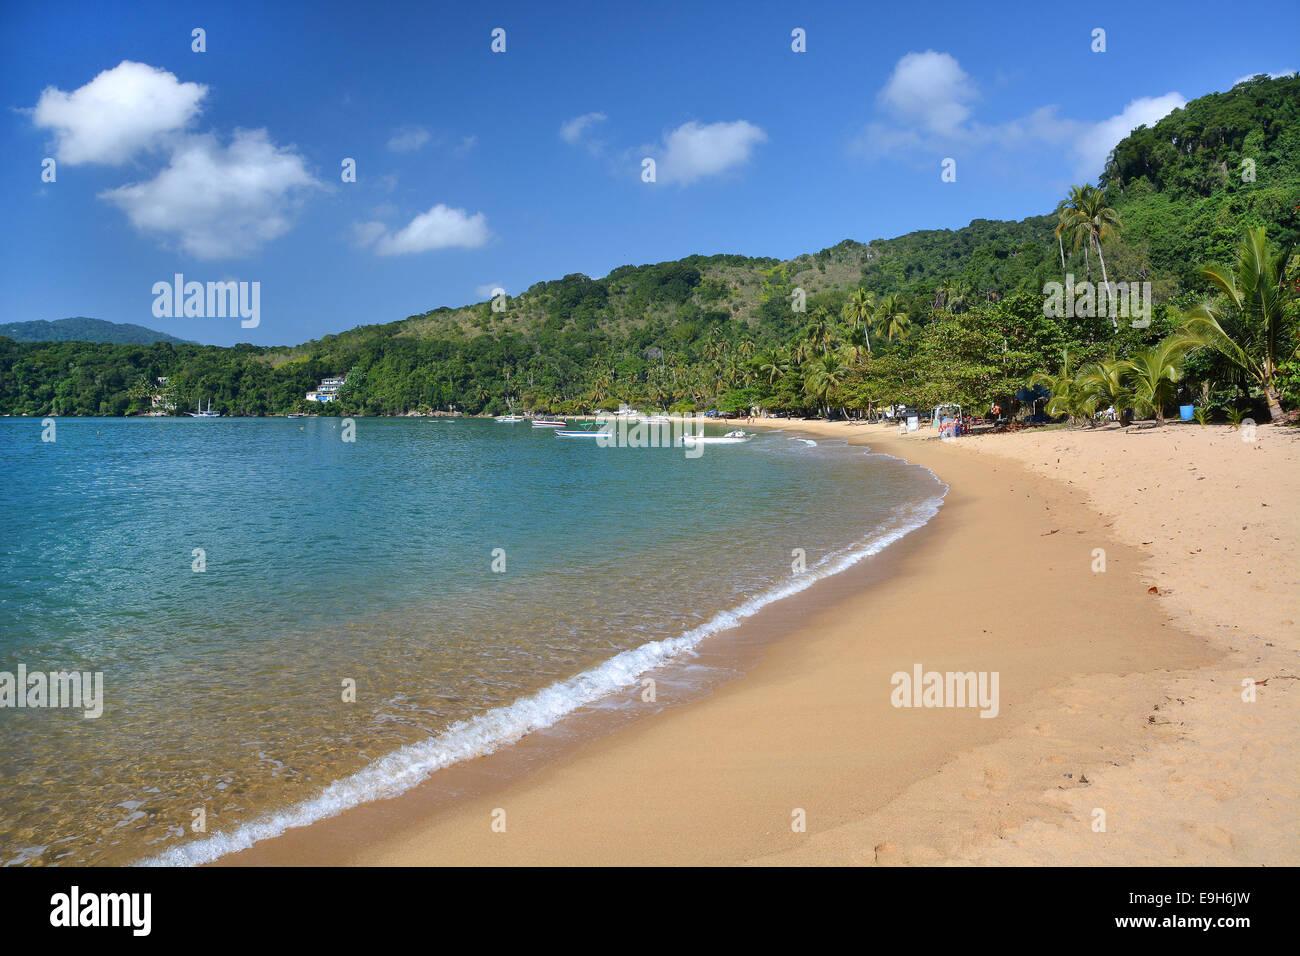 Lopes mendes beach, Angra dos Reis, Ilha Grande, stato di Rio de janeiro, Brasile Immagini Stock